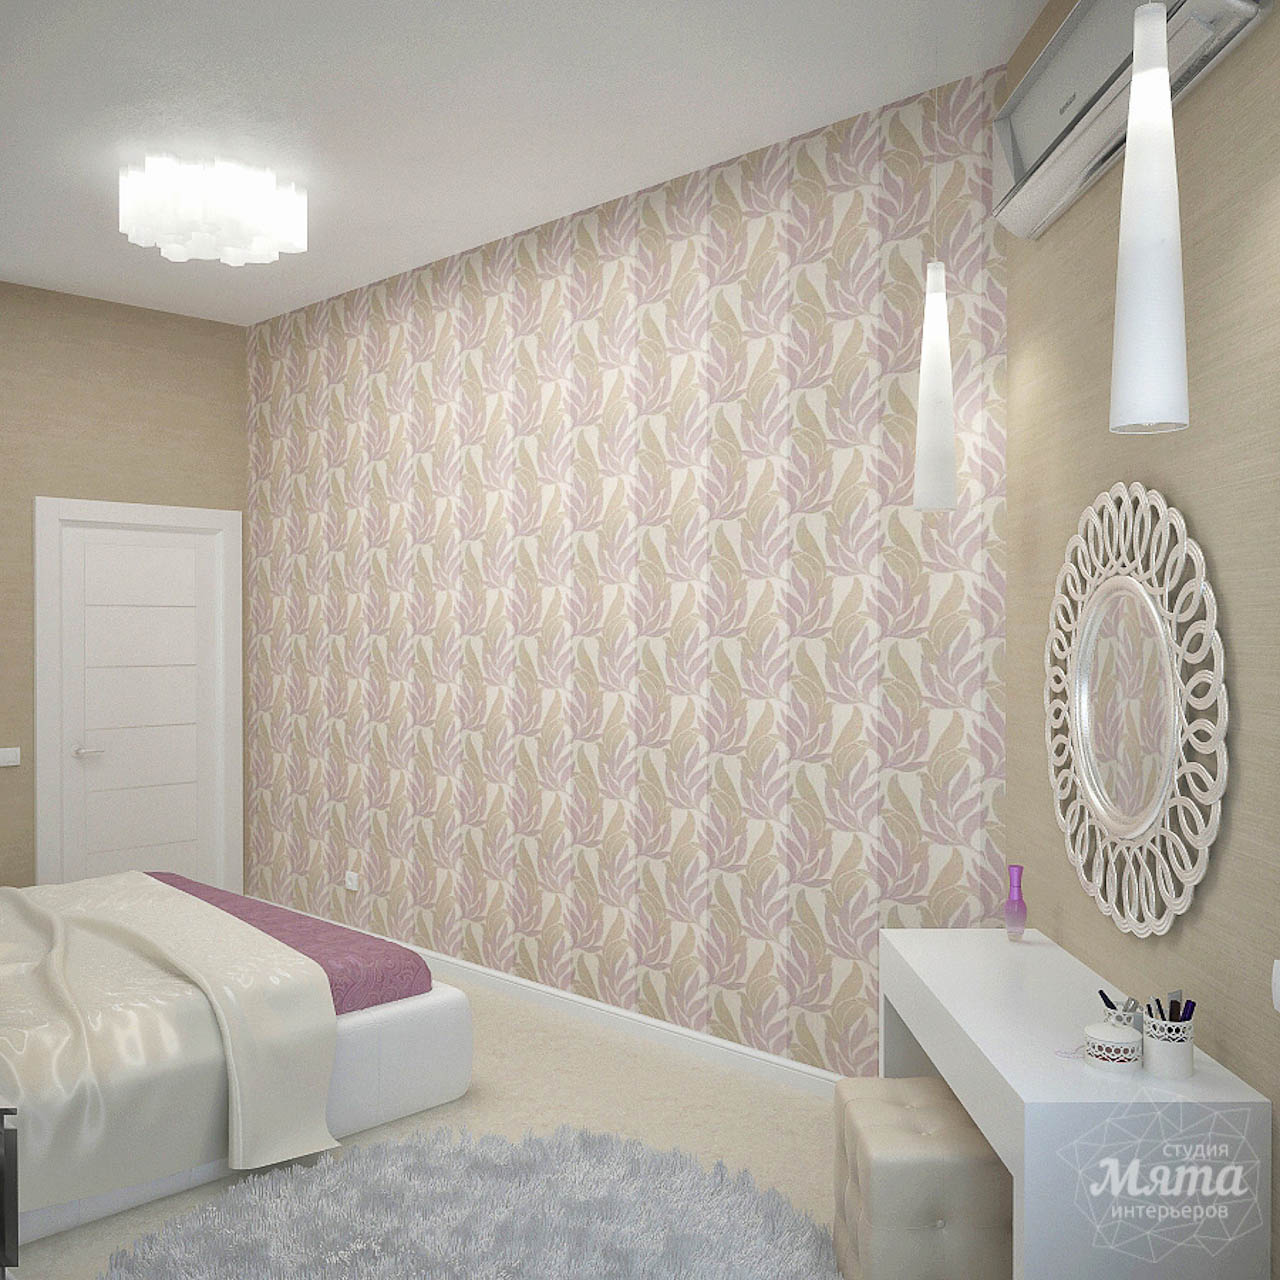 Дизайн интерьера и ремонт трехкомнатной квартиры по ул. Чкалова 124 img340120255